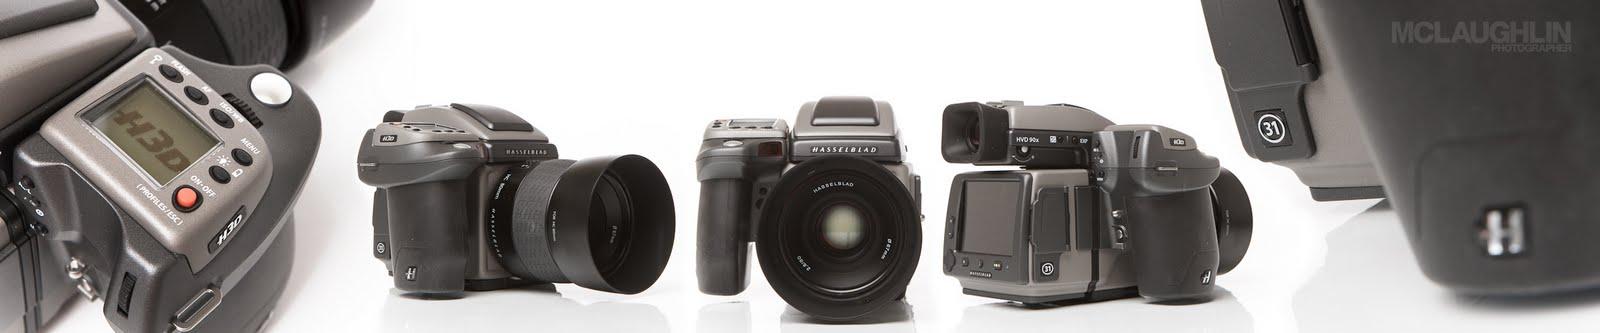 Hasselblad H3DII H3D Medium Format Digital Camera Photography Photographer